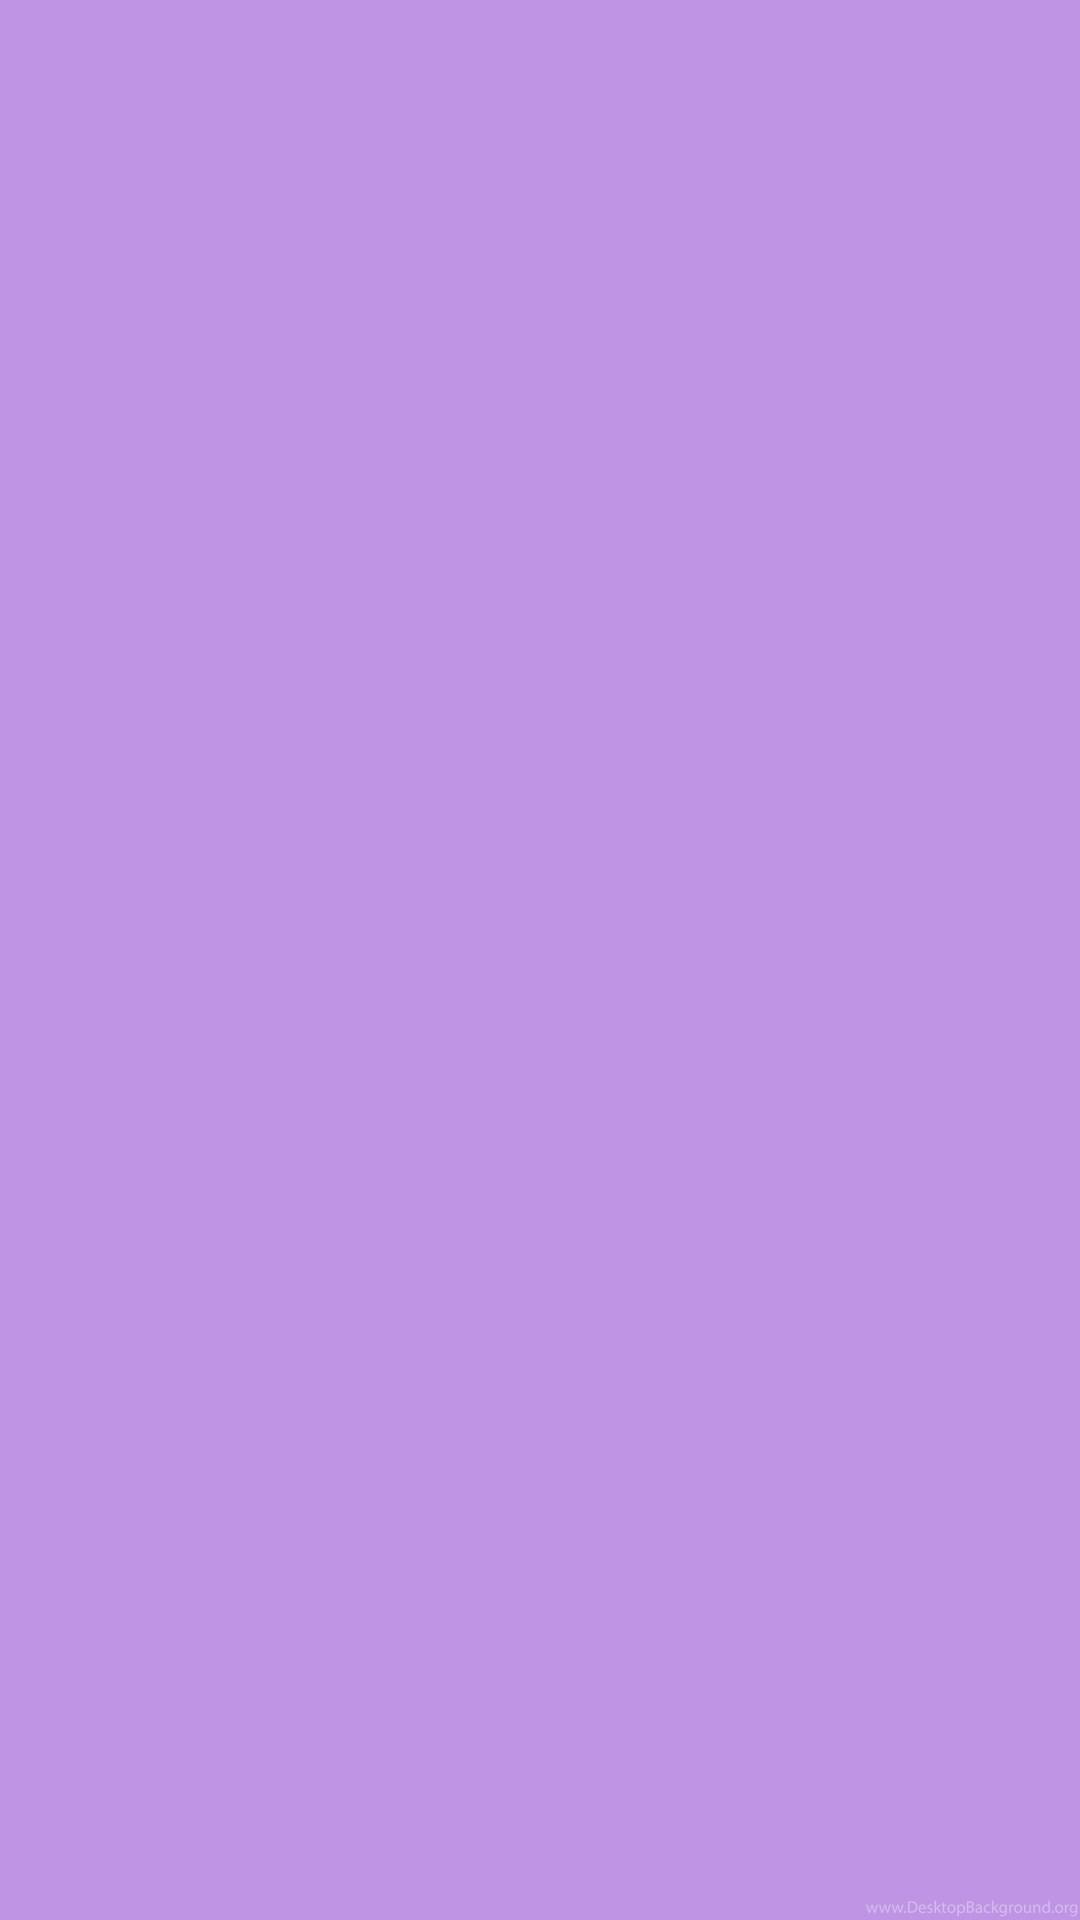 Solid Iphone Wallpaper 2048x2048 Bright Lavender Solid Color Backgrounds Desktop